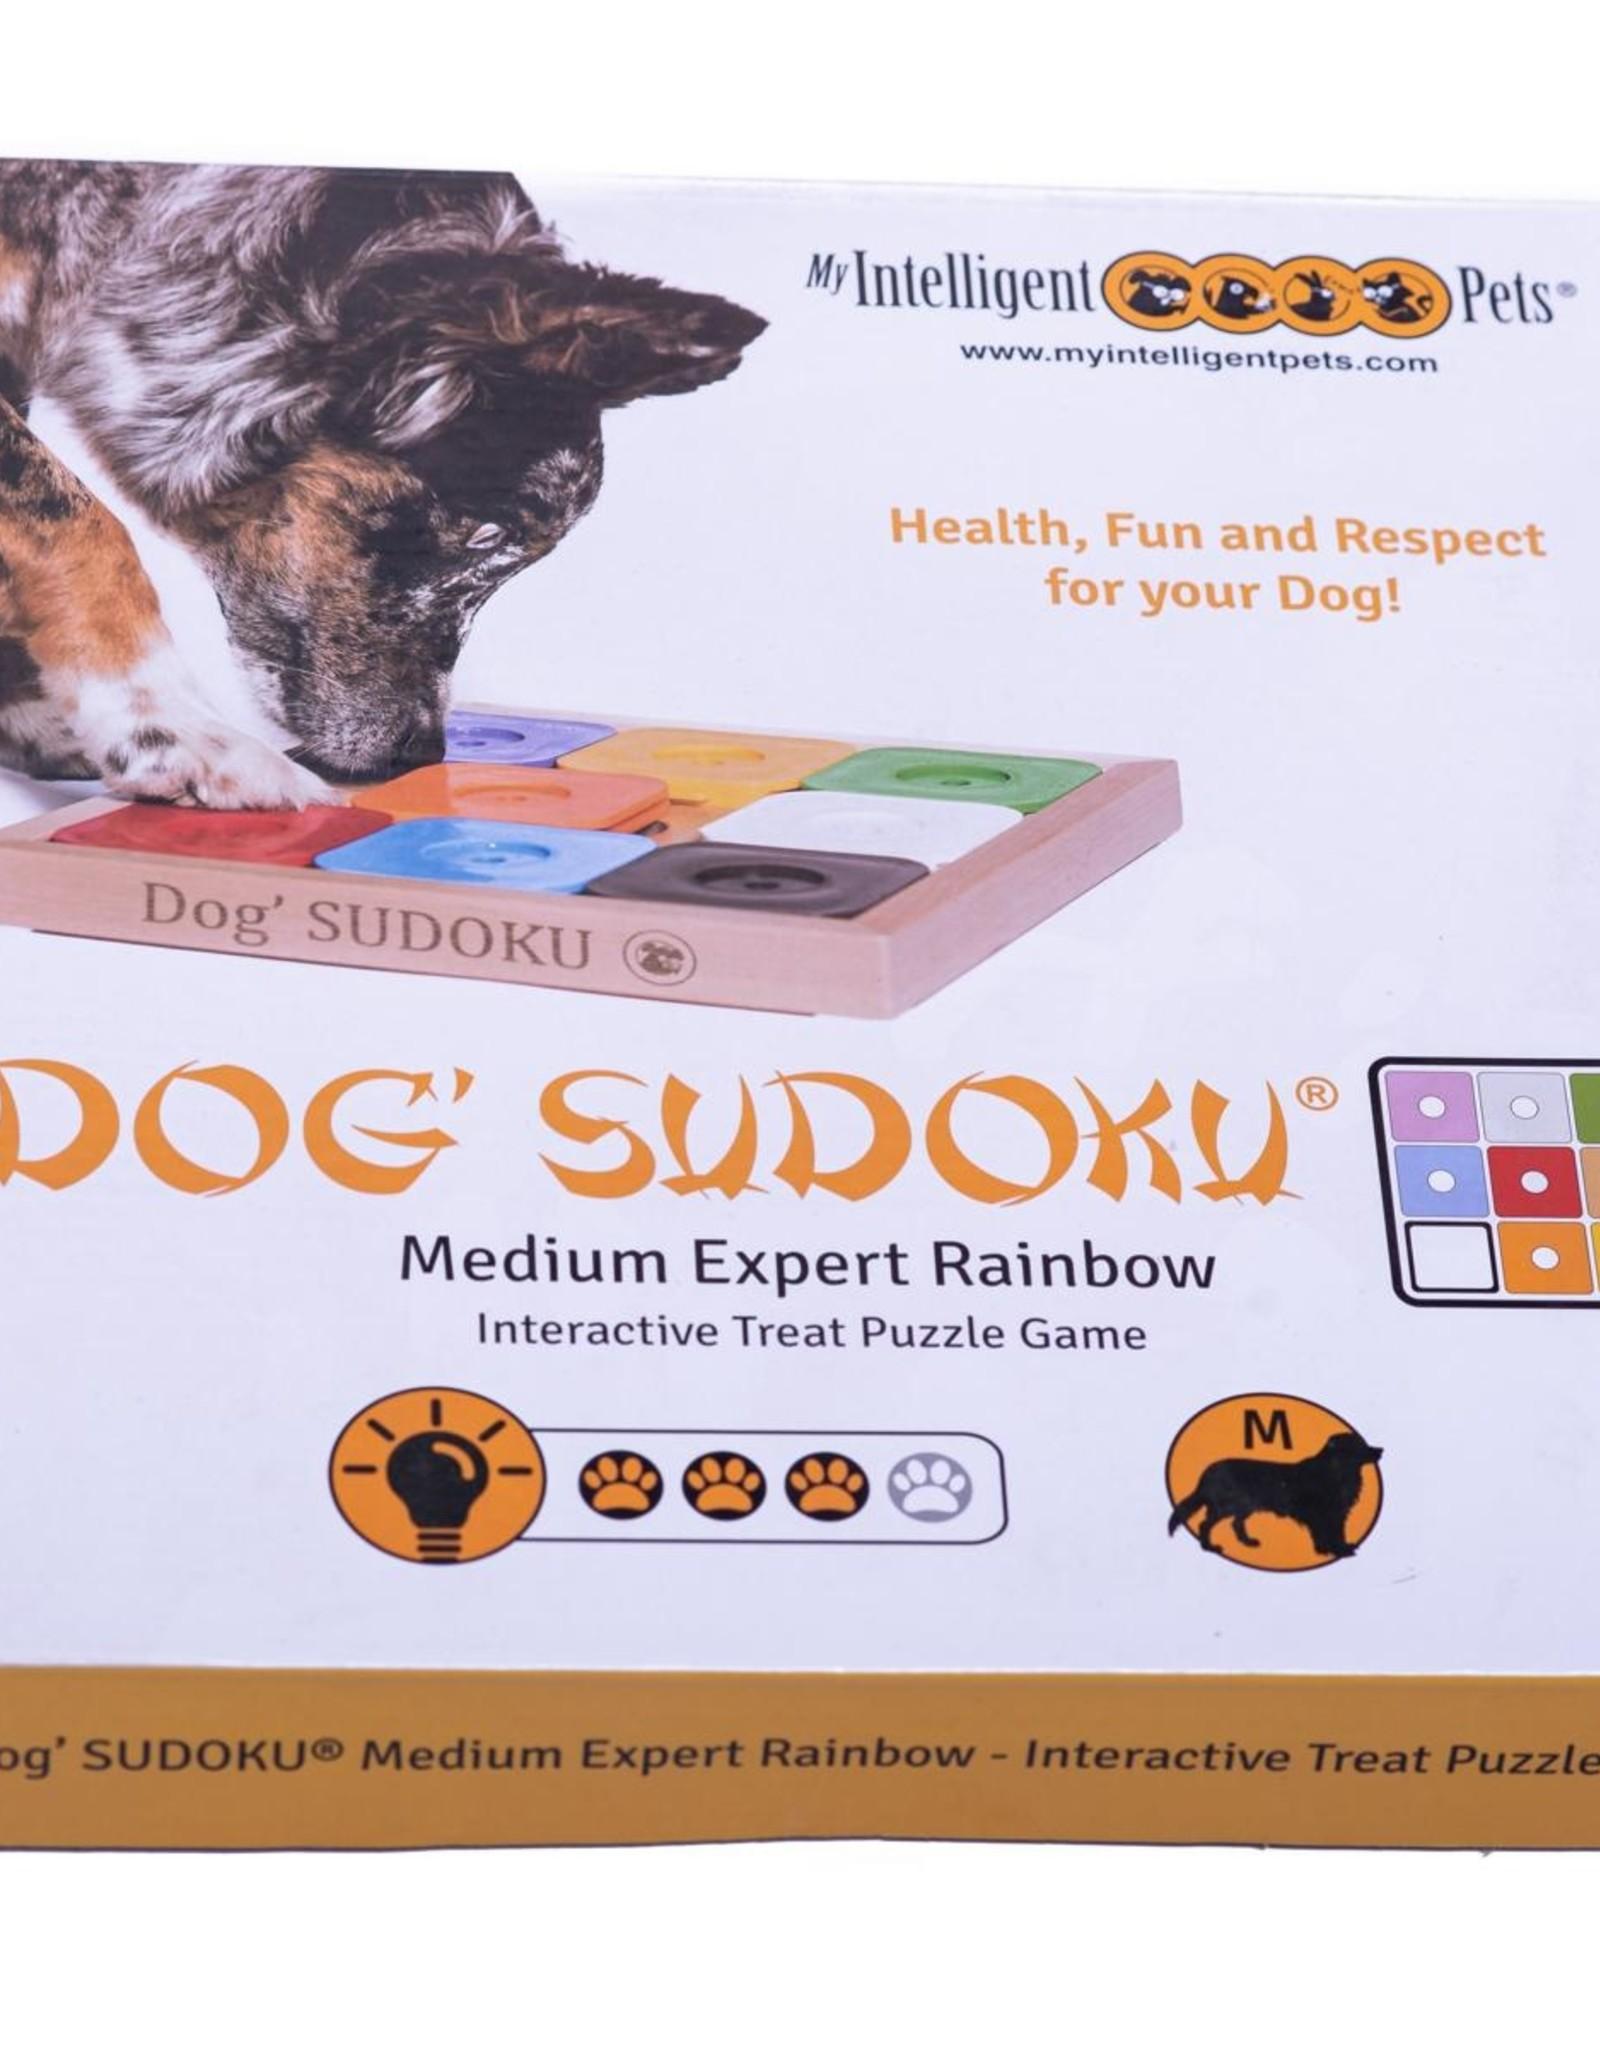 My Intelligent Pets Dog Sudoku Expert